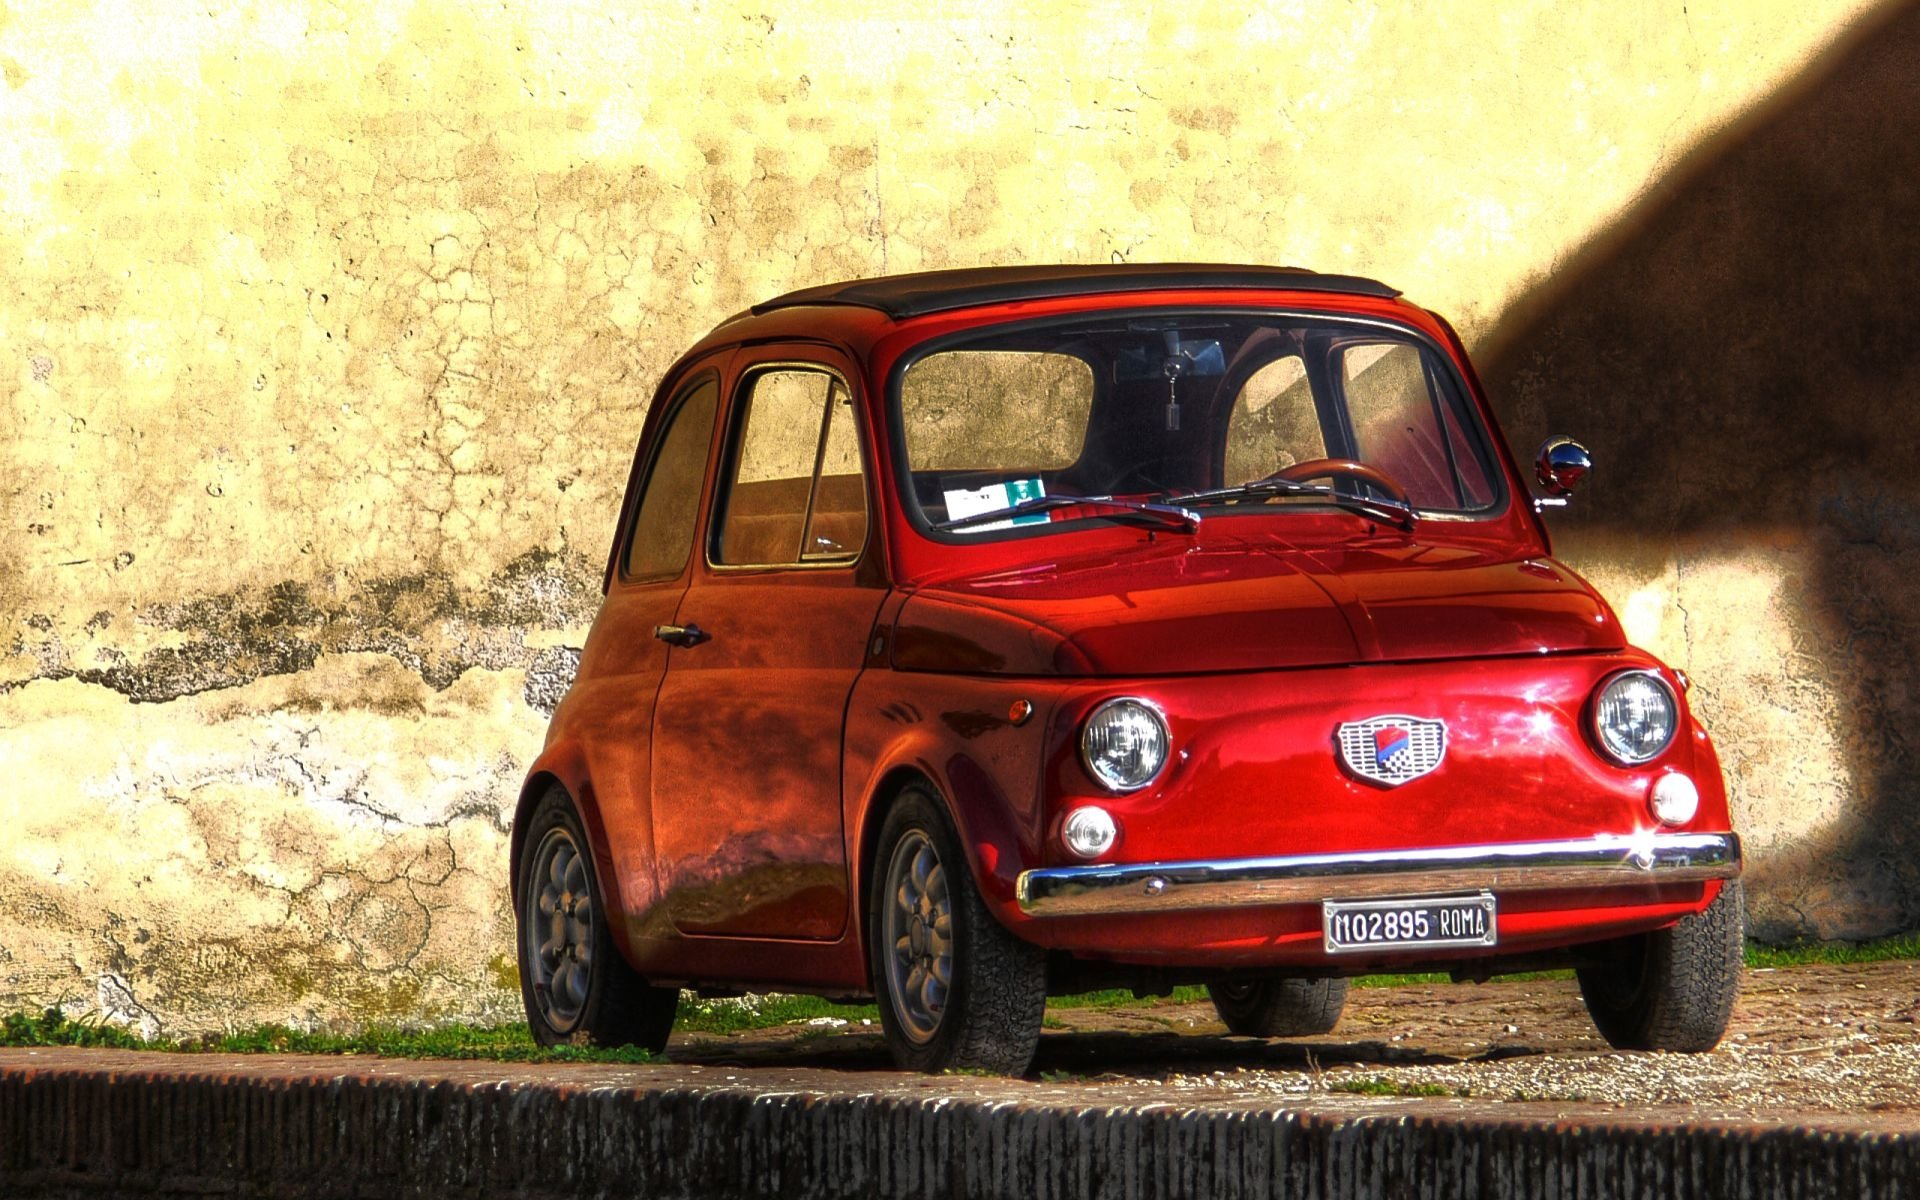 Fiat 500 Hd Wallpaper Background Image 1920x1200 Id 592091